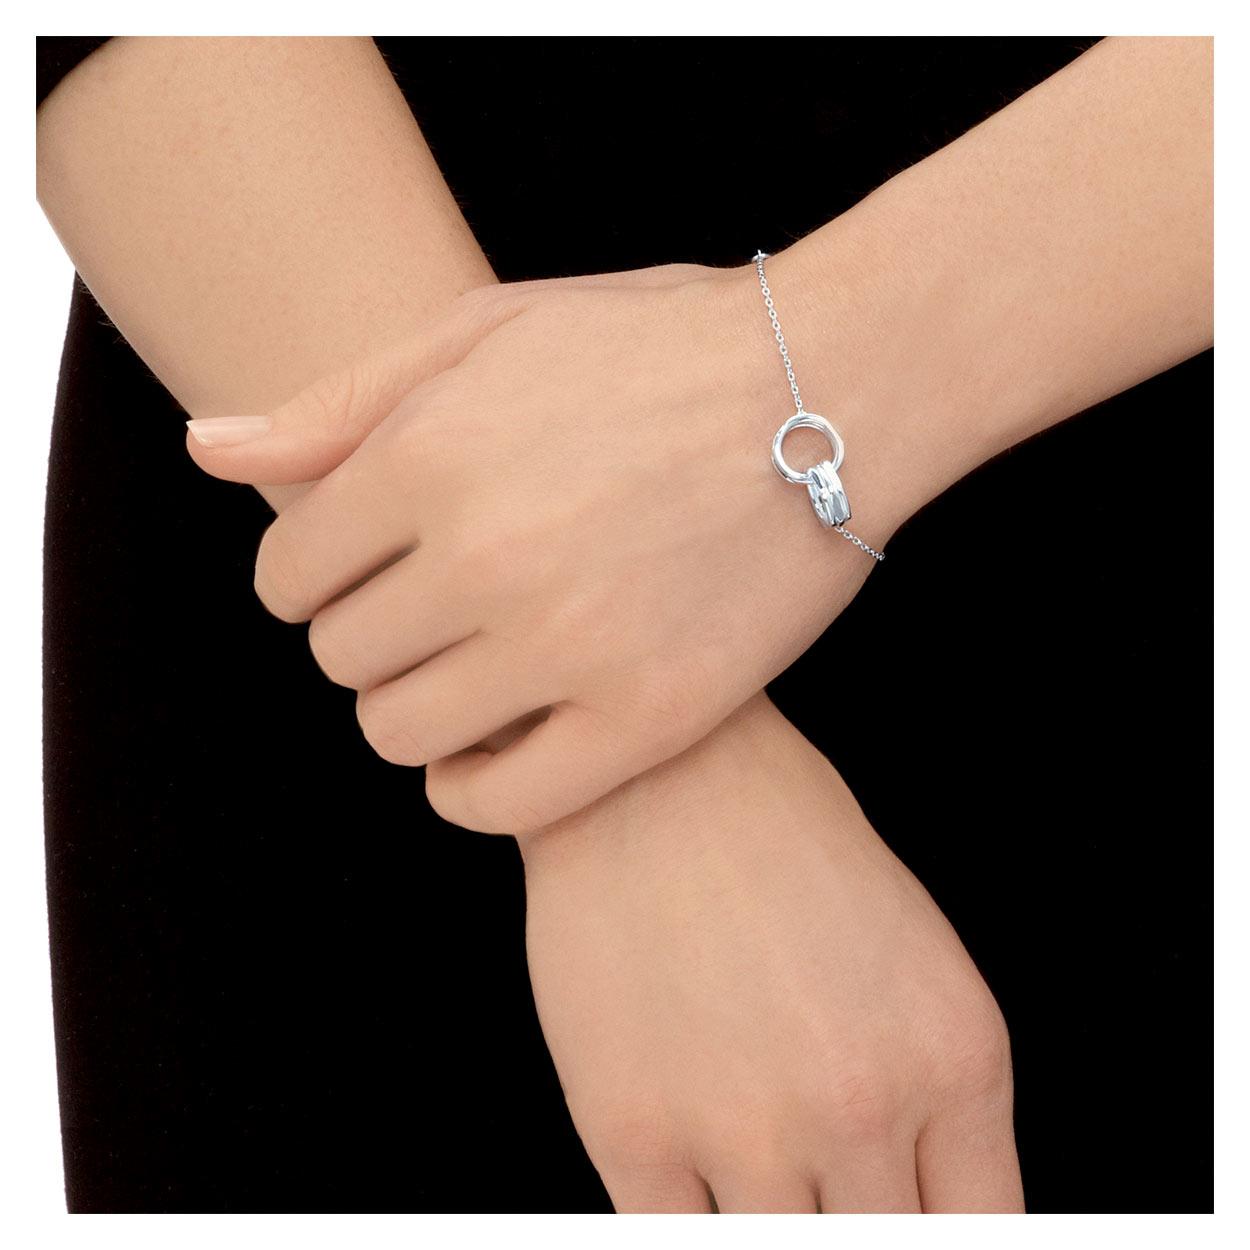 91eb7ccd2755 20/20 Sterling Silver Interlocking Bracelet. Home>Brands>Links ...